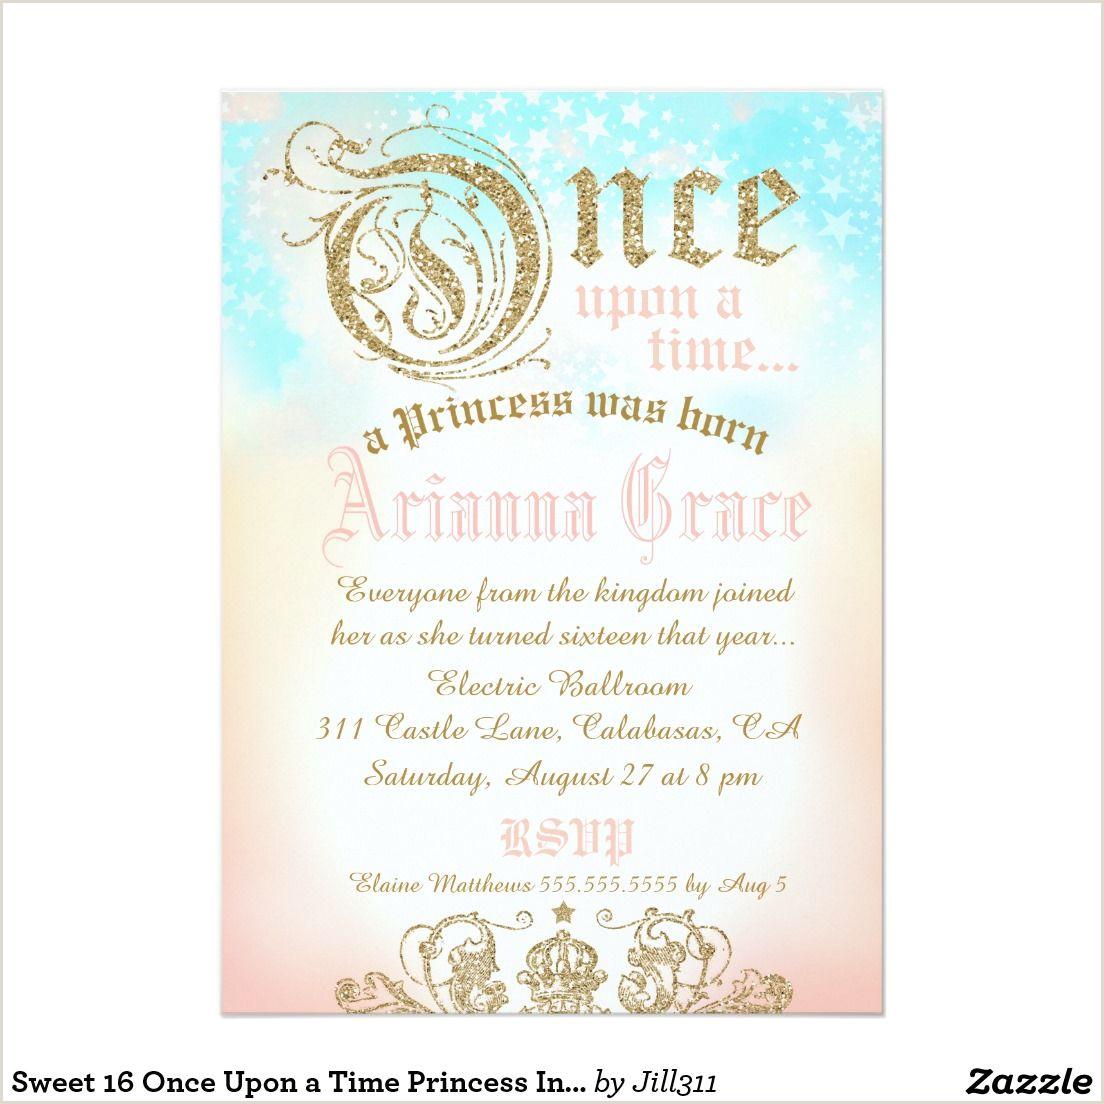 Sweet 16 Invite Ideas Sweet 16 Ce Upon A Time Princess Invitation